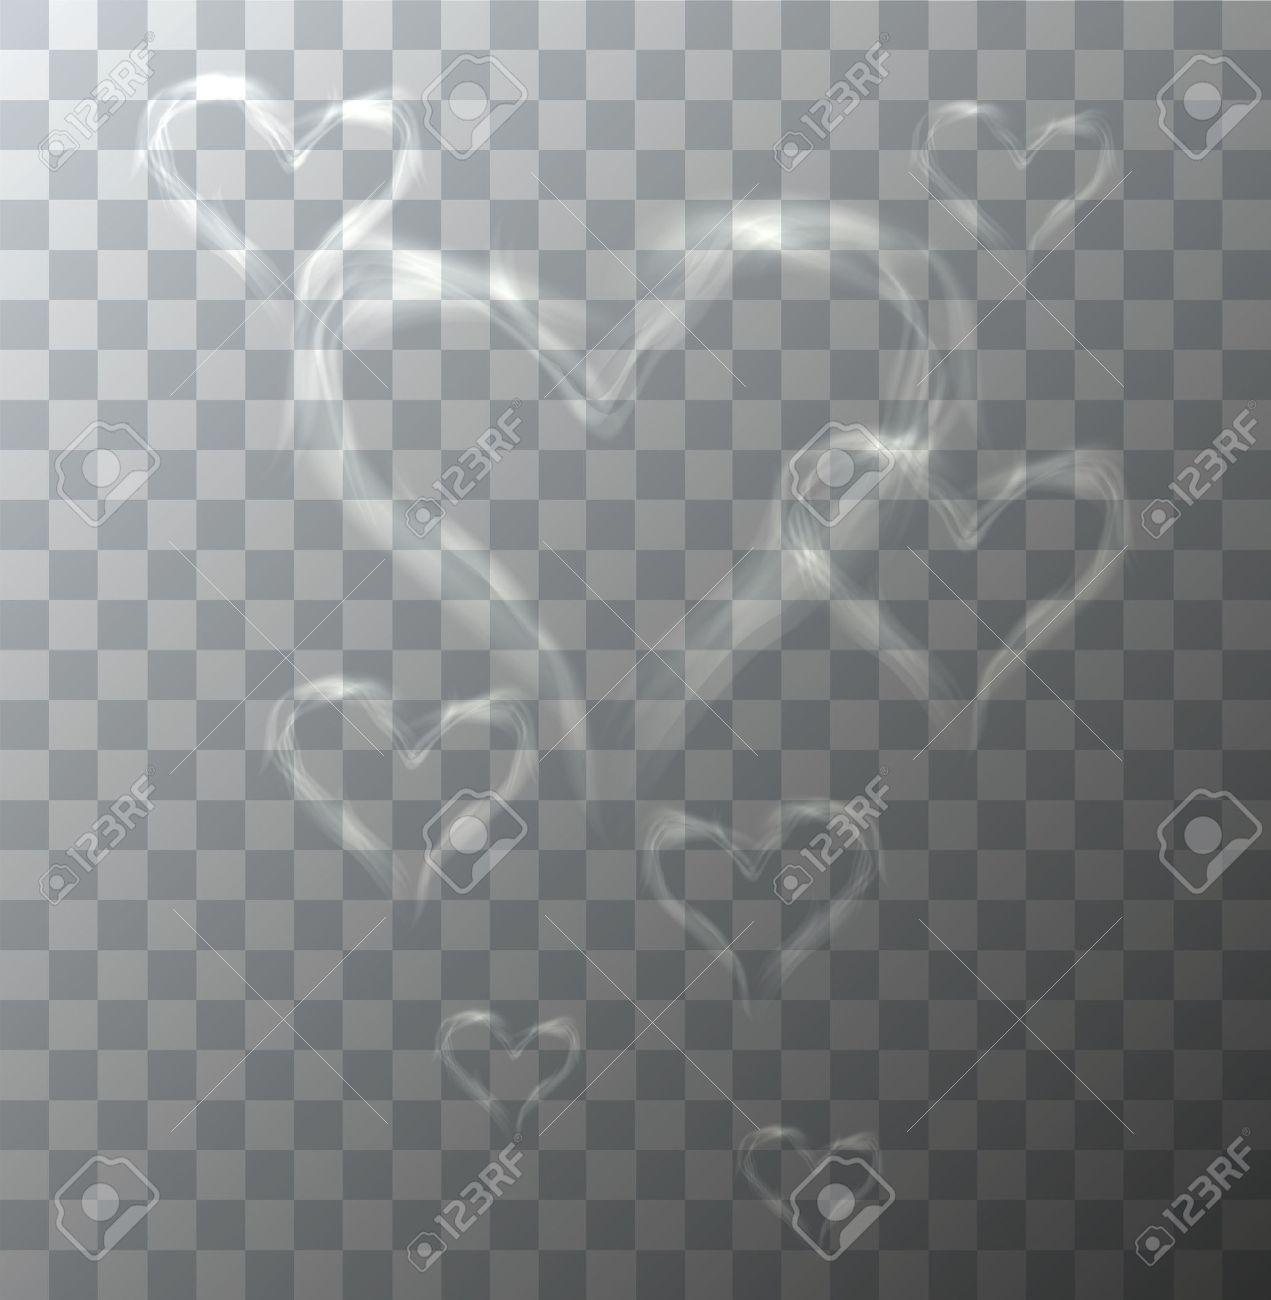 Vector modern heart from smoke on sample background. Eps10 - 50901957